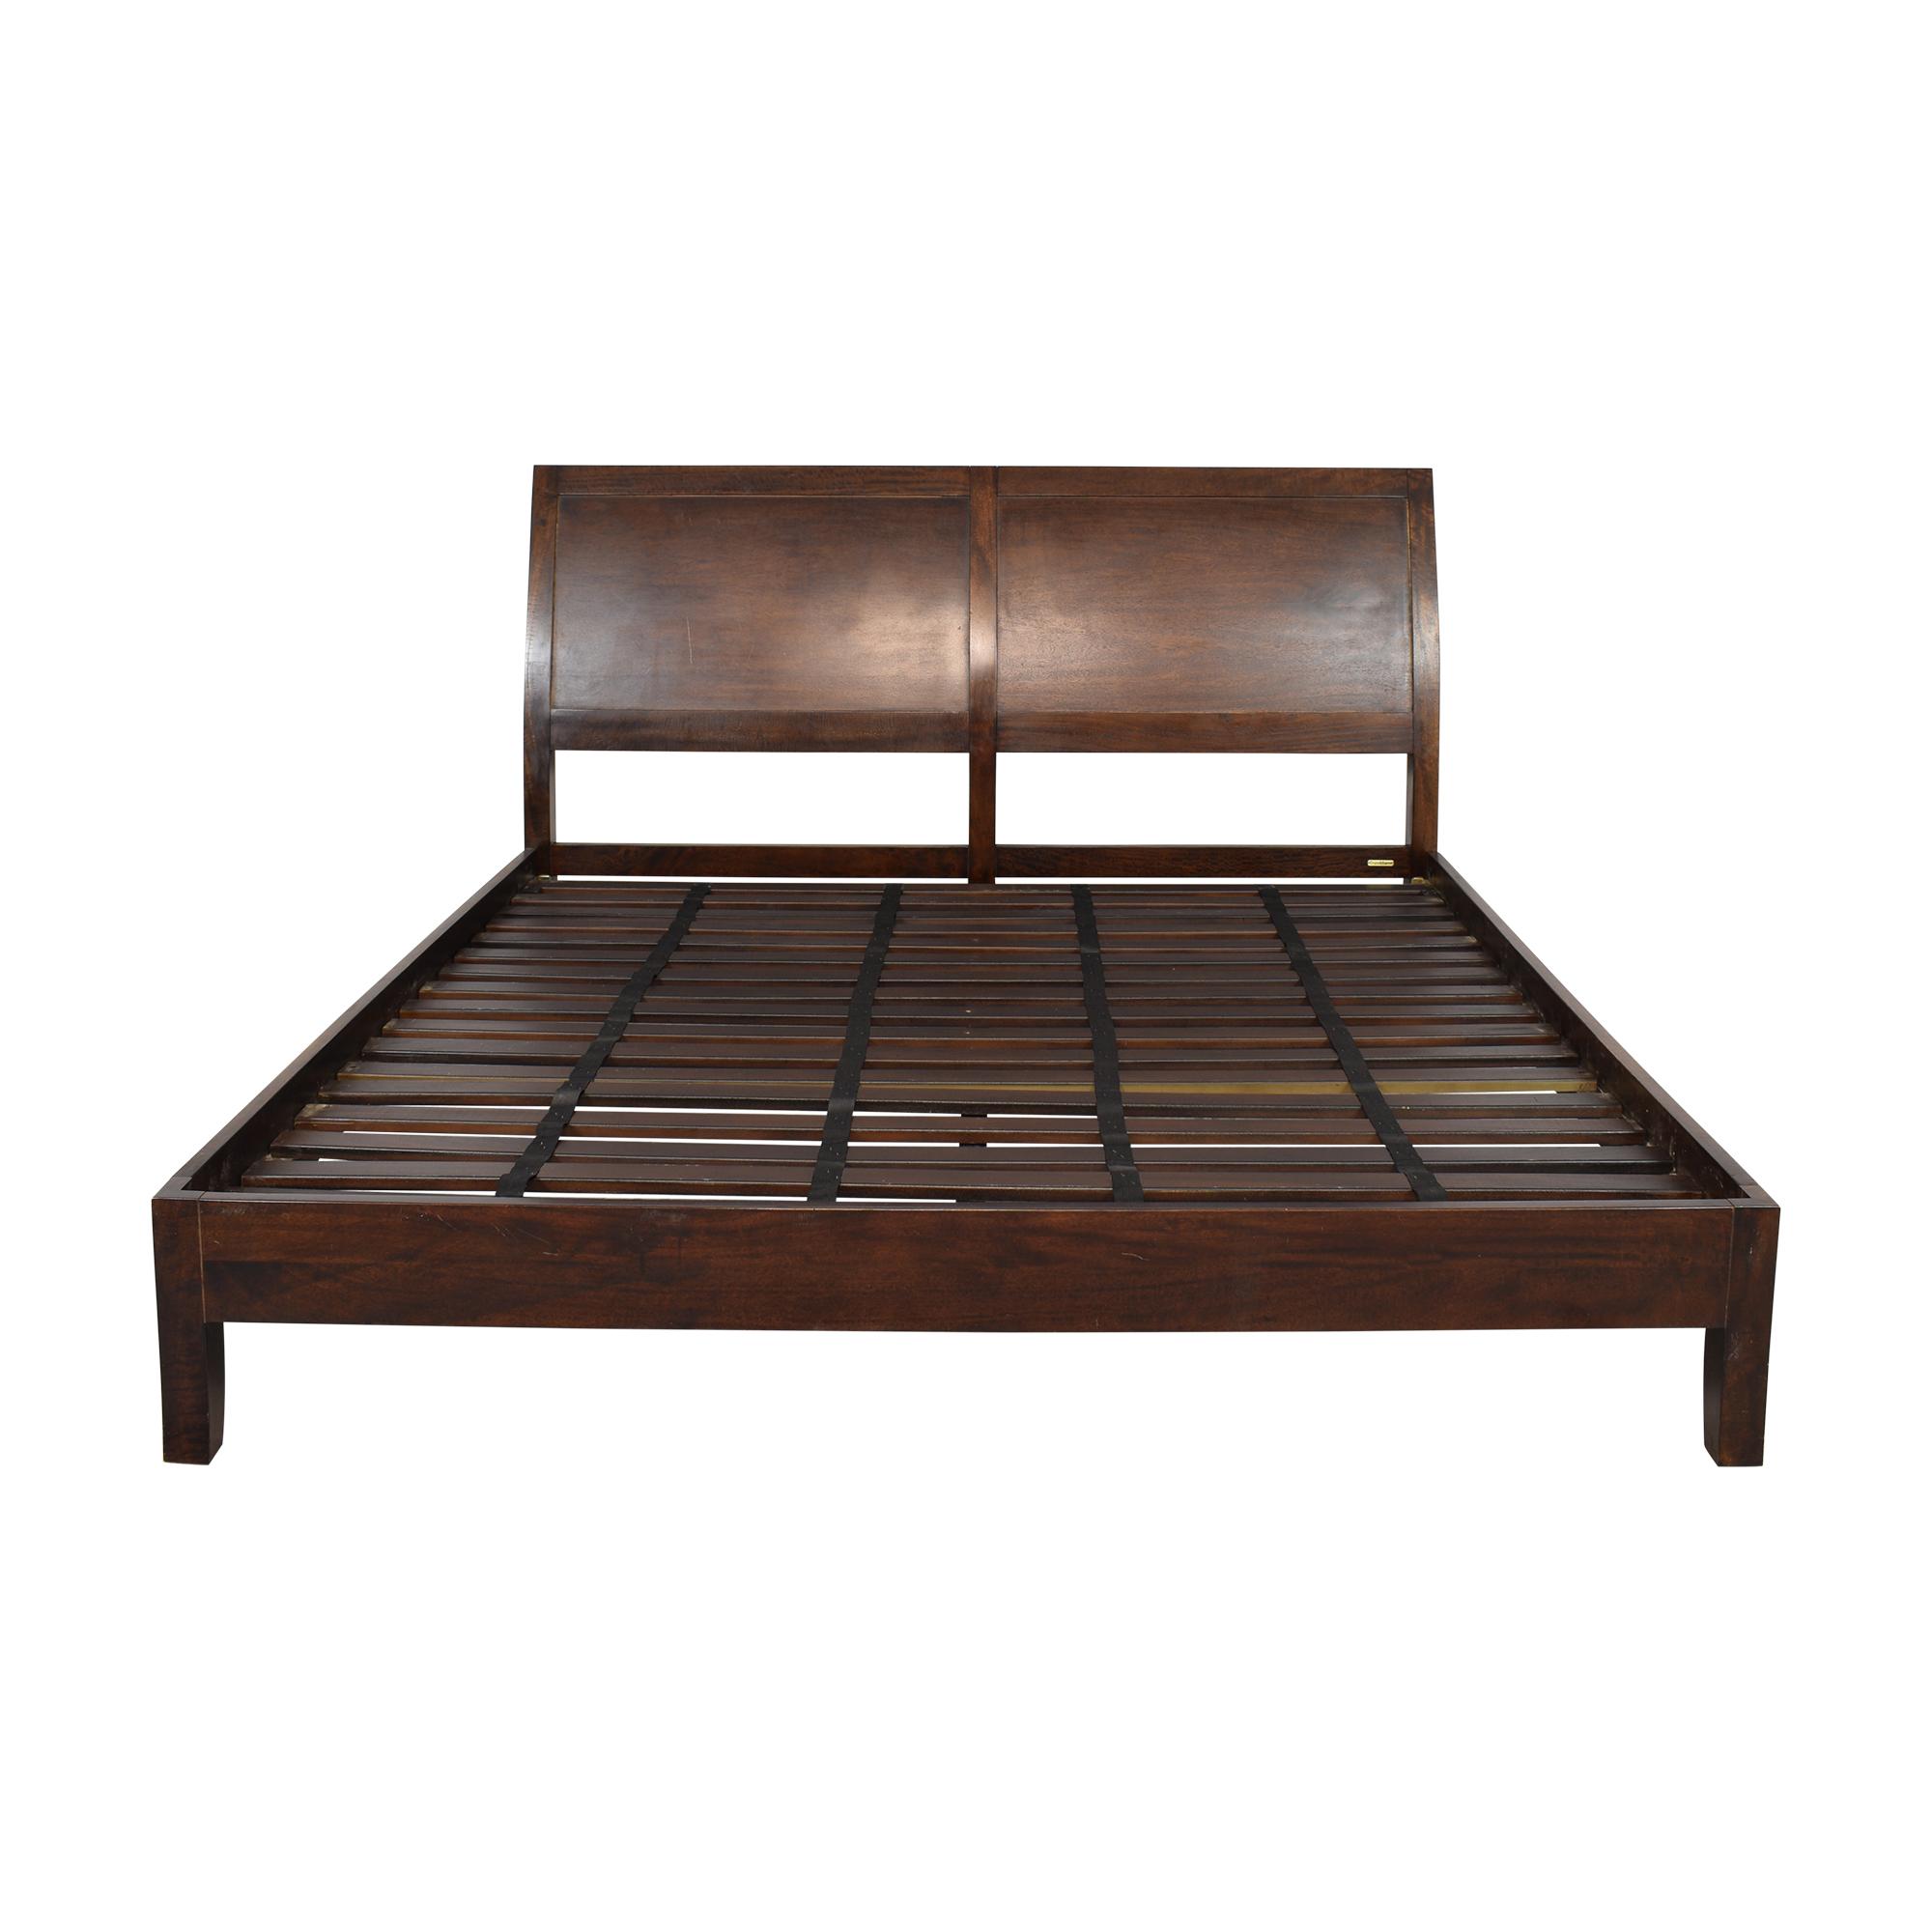 shop Crate & Barrel Dawson King Sleigh Bed Crate & Barrel Beds